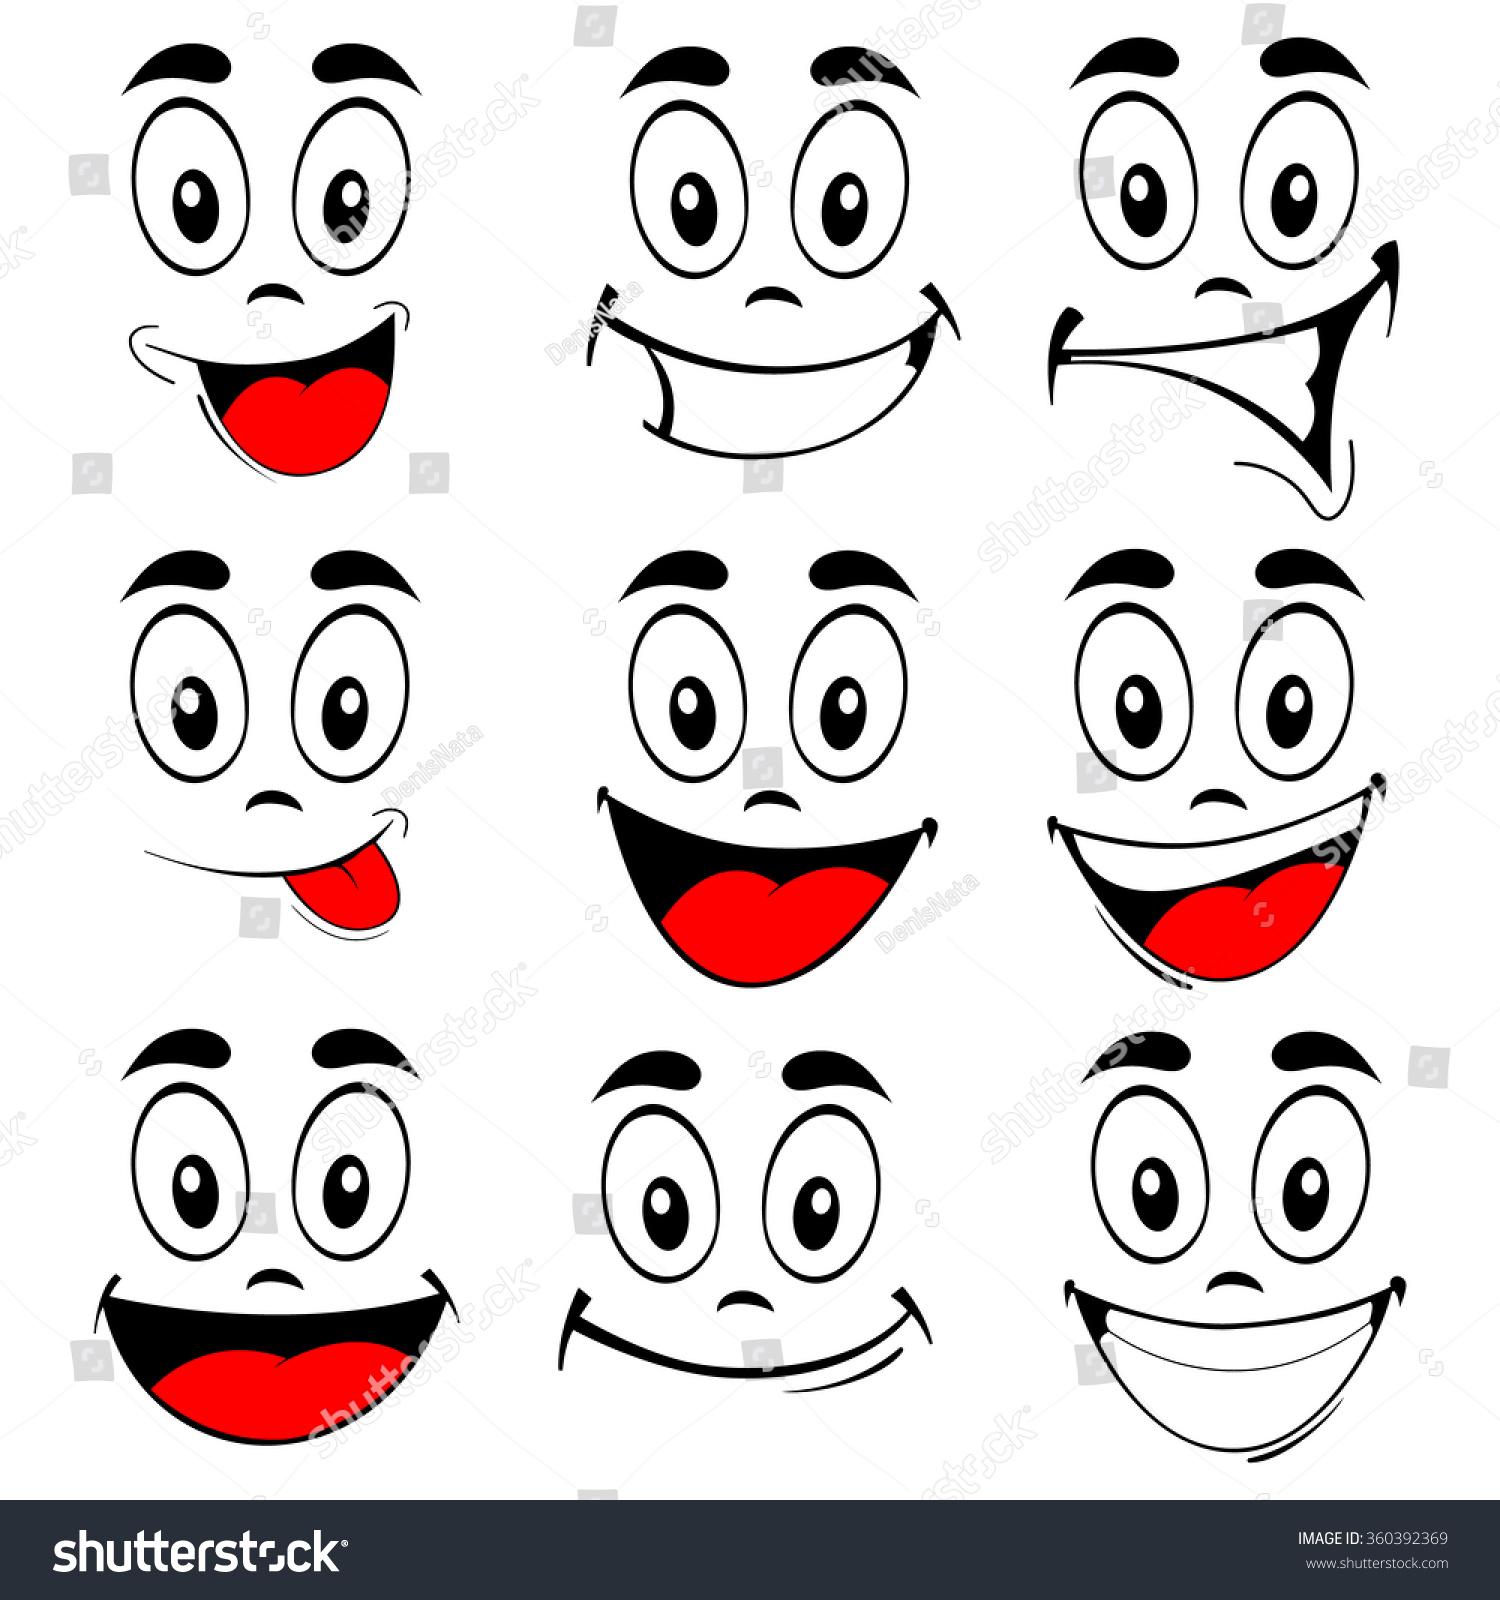 Vector Illustration Set Smiling Cartoon Faces Stock Vector ...